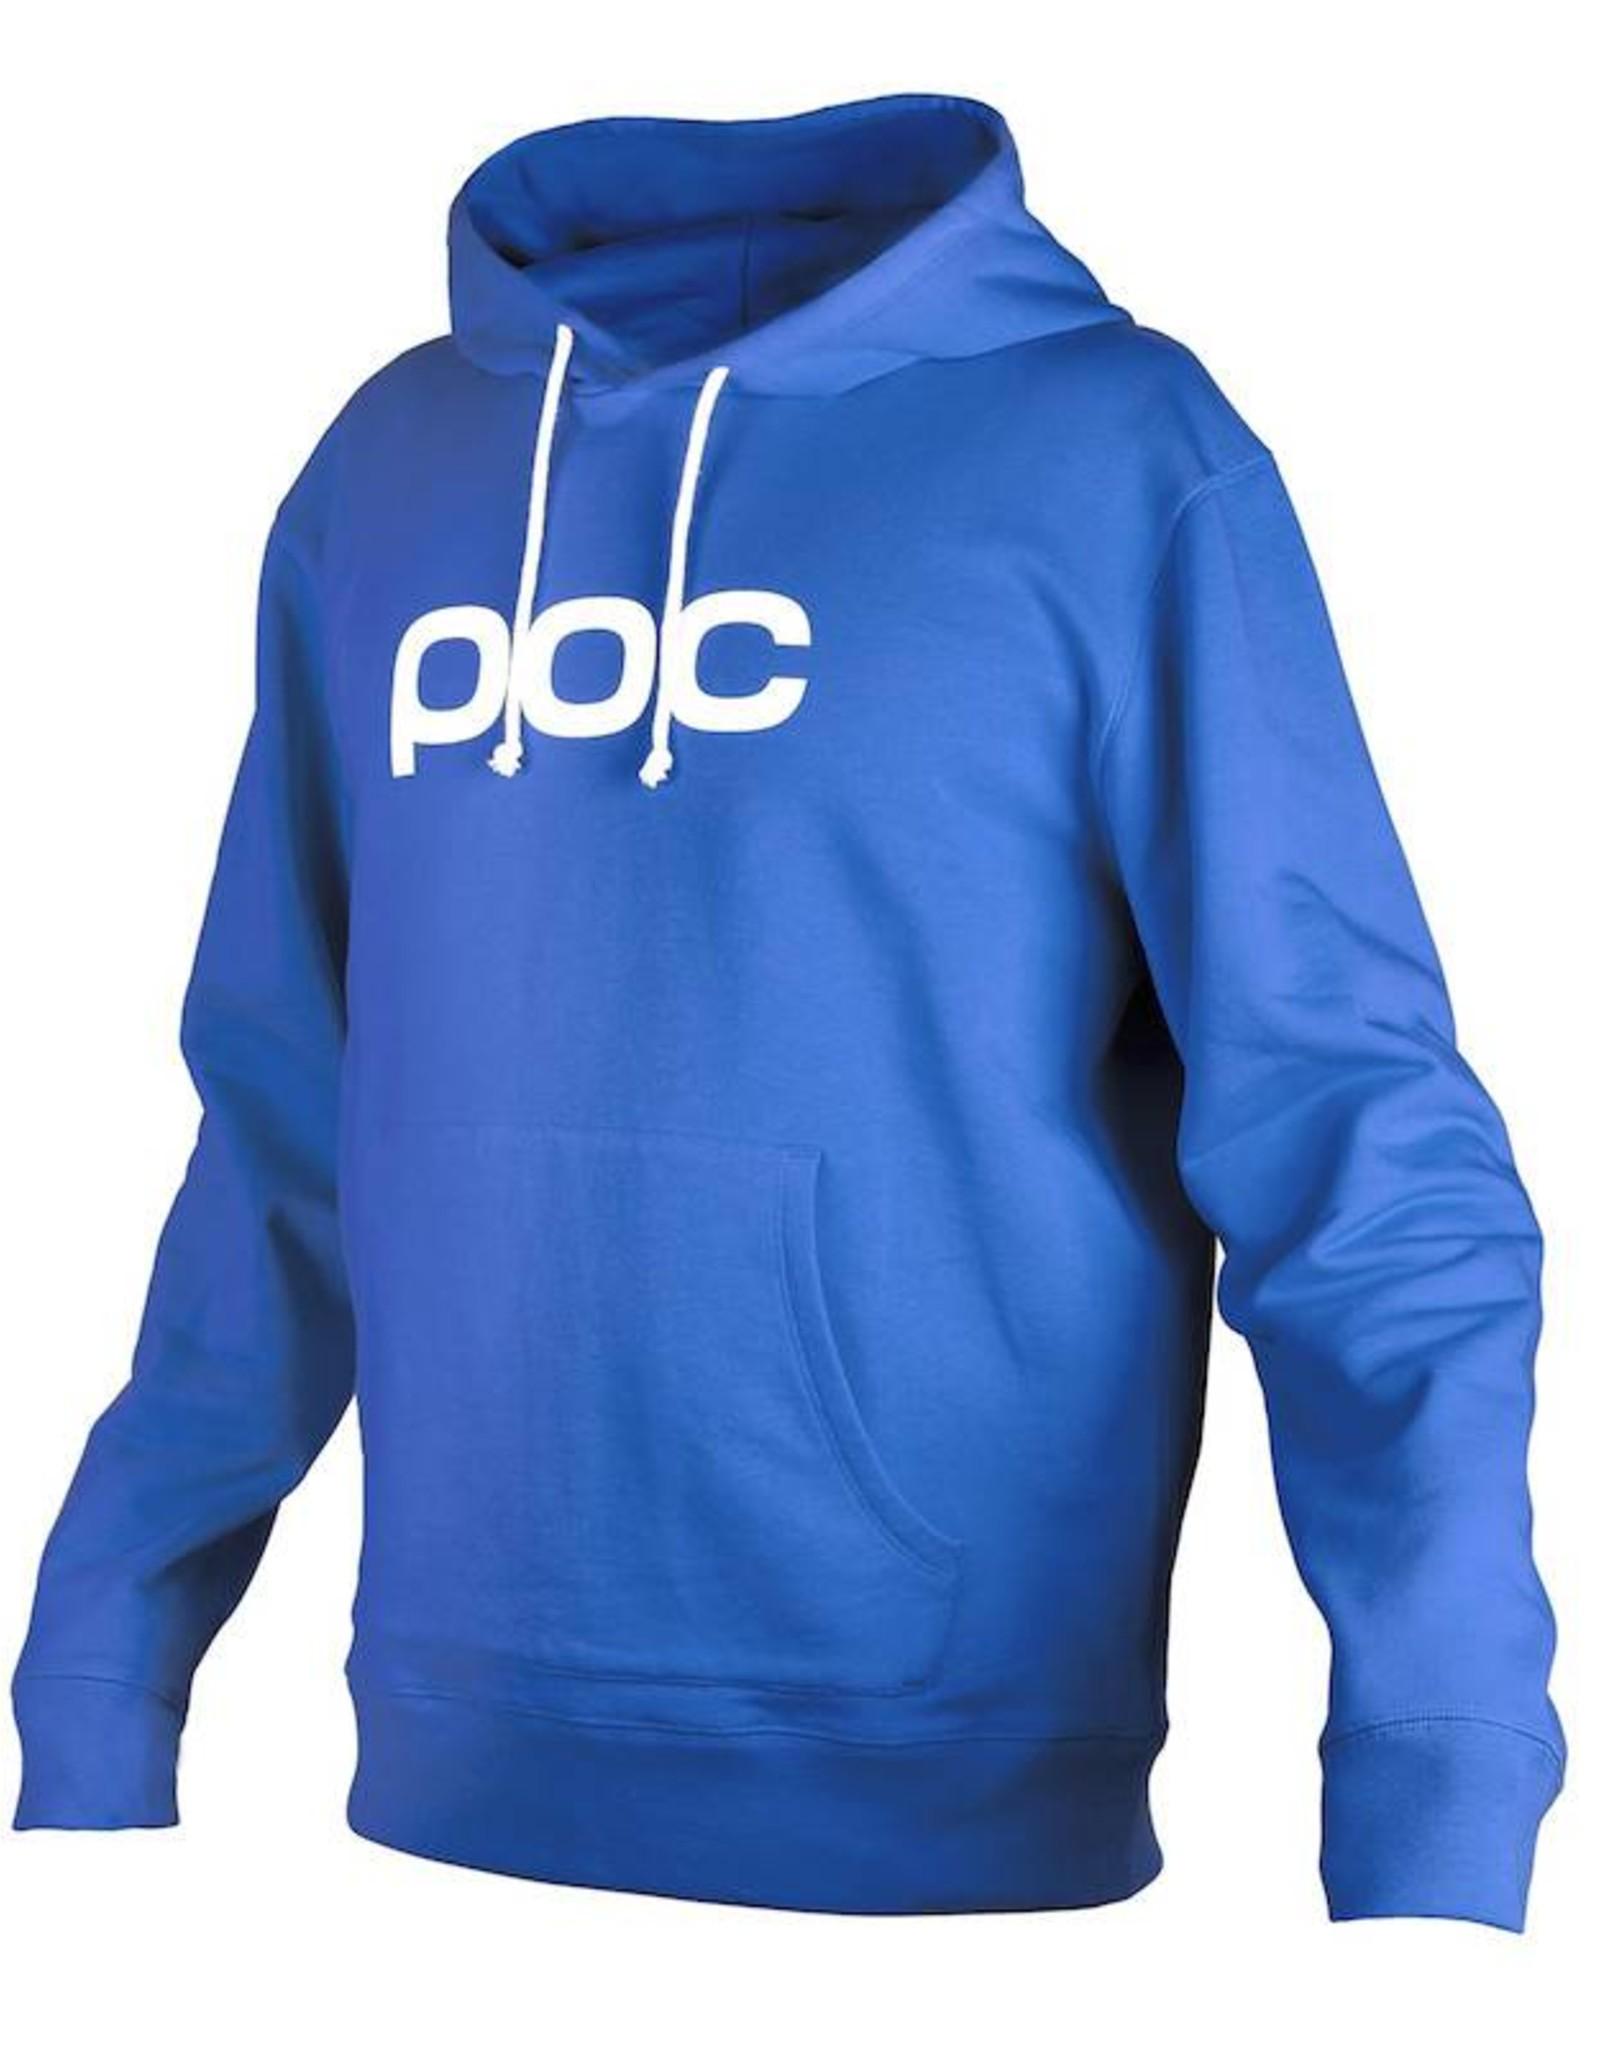 Poc Hood Color